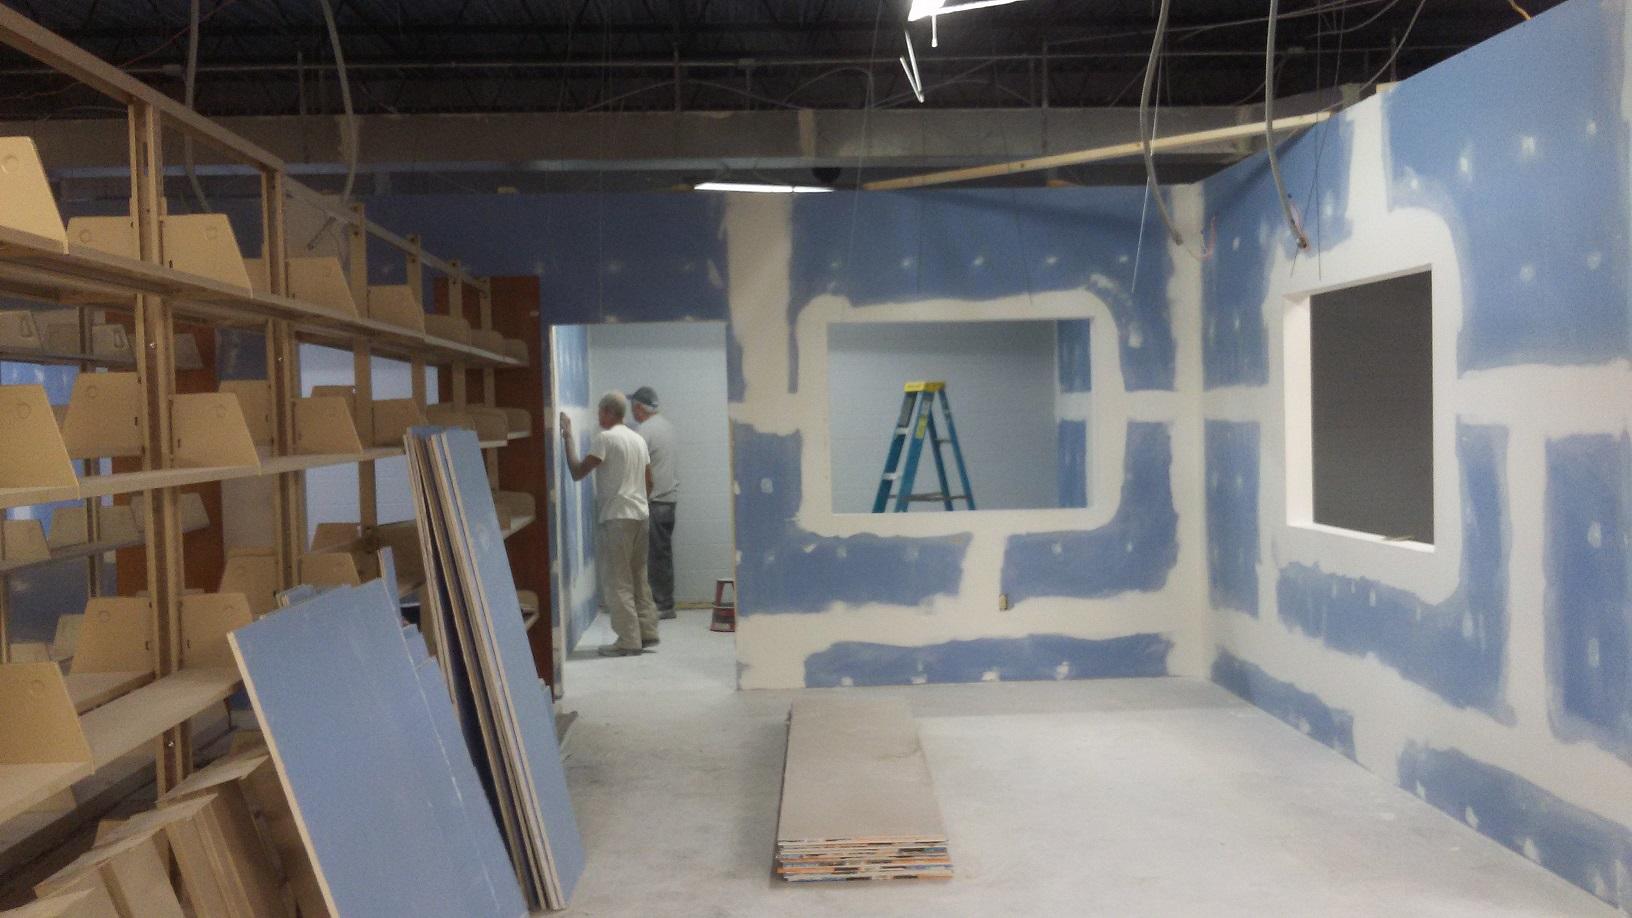 Mudding the drywall